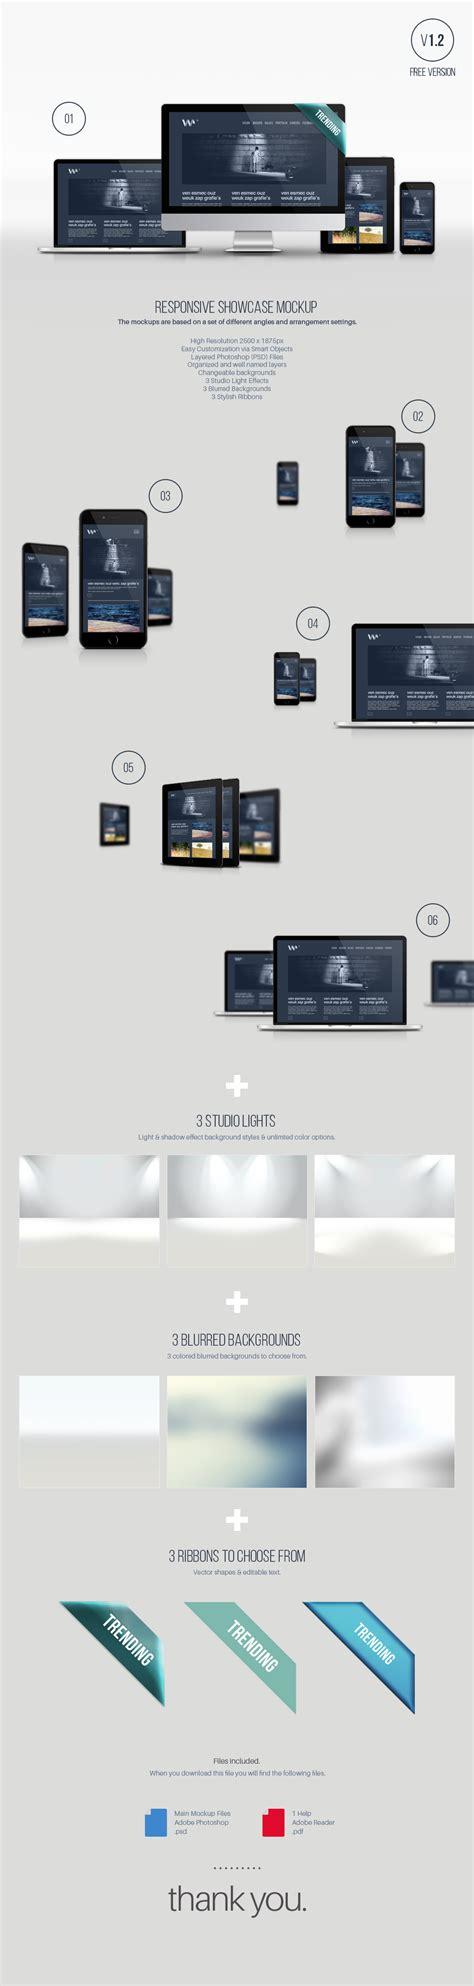 web design showcase mockup responsive showcase device mockup theme raid